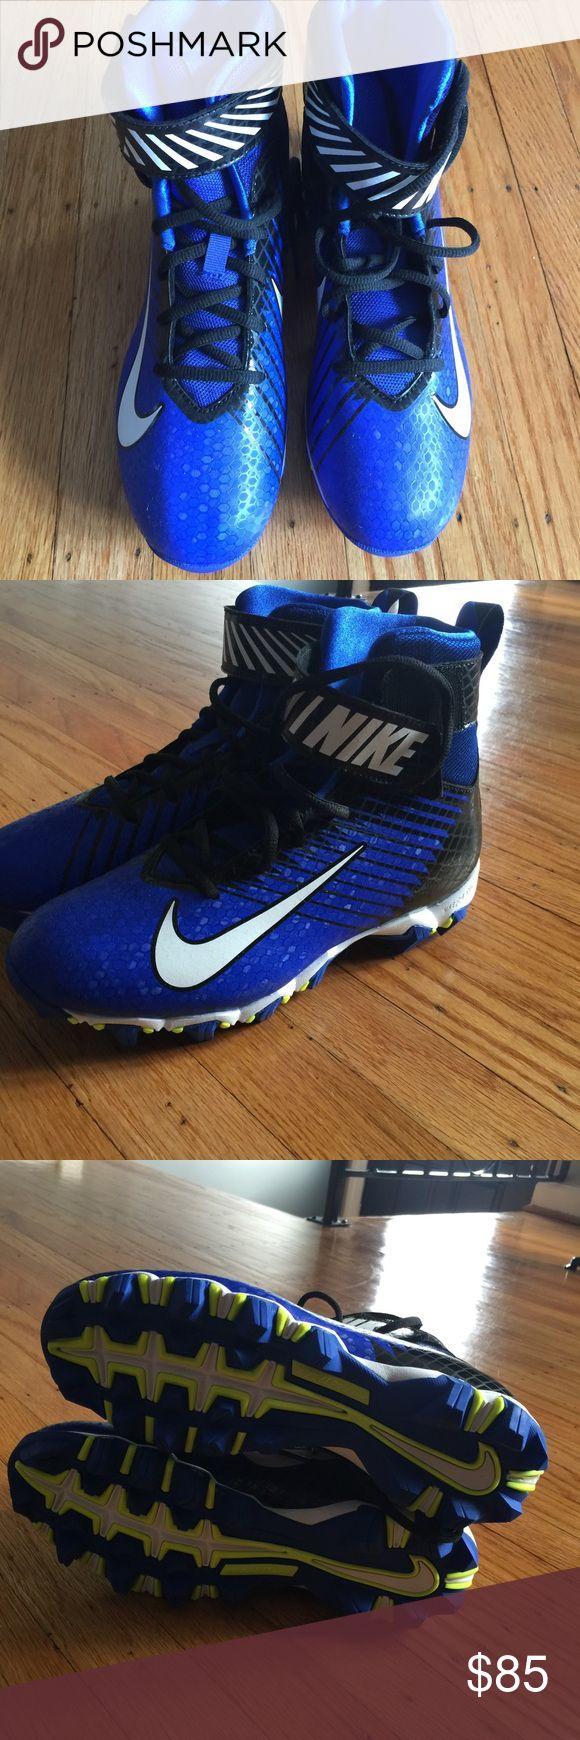 Nike football/ baseball cleats Brand new nike football/ baseball cleats. High top. No box Nike Shoes Athletic Shoes